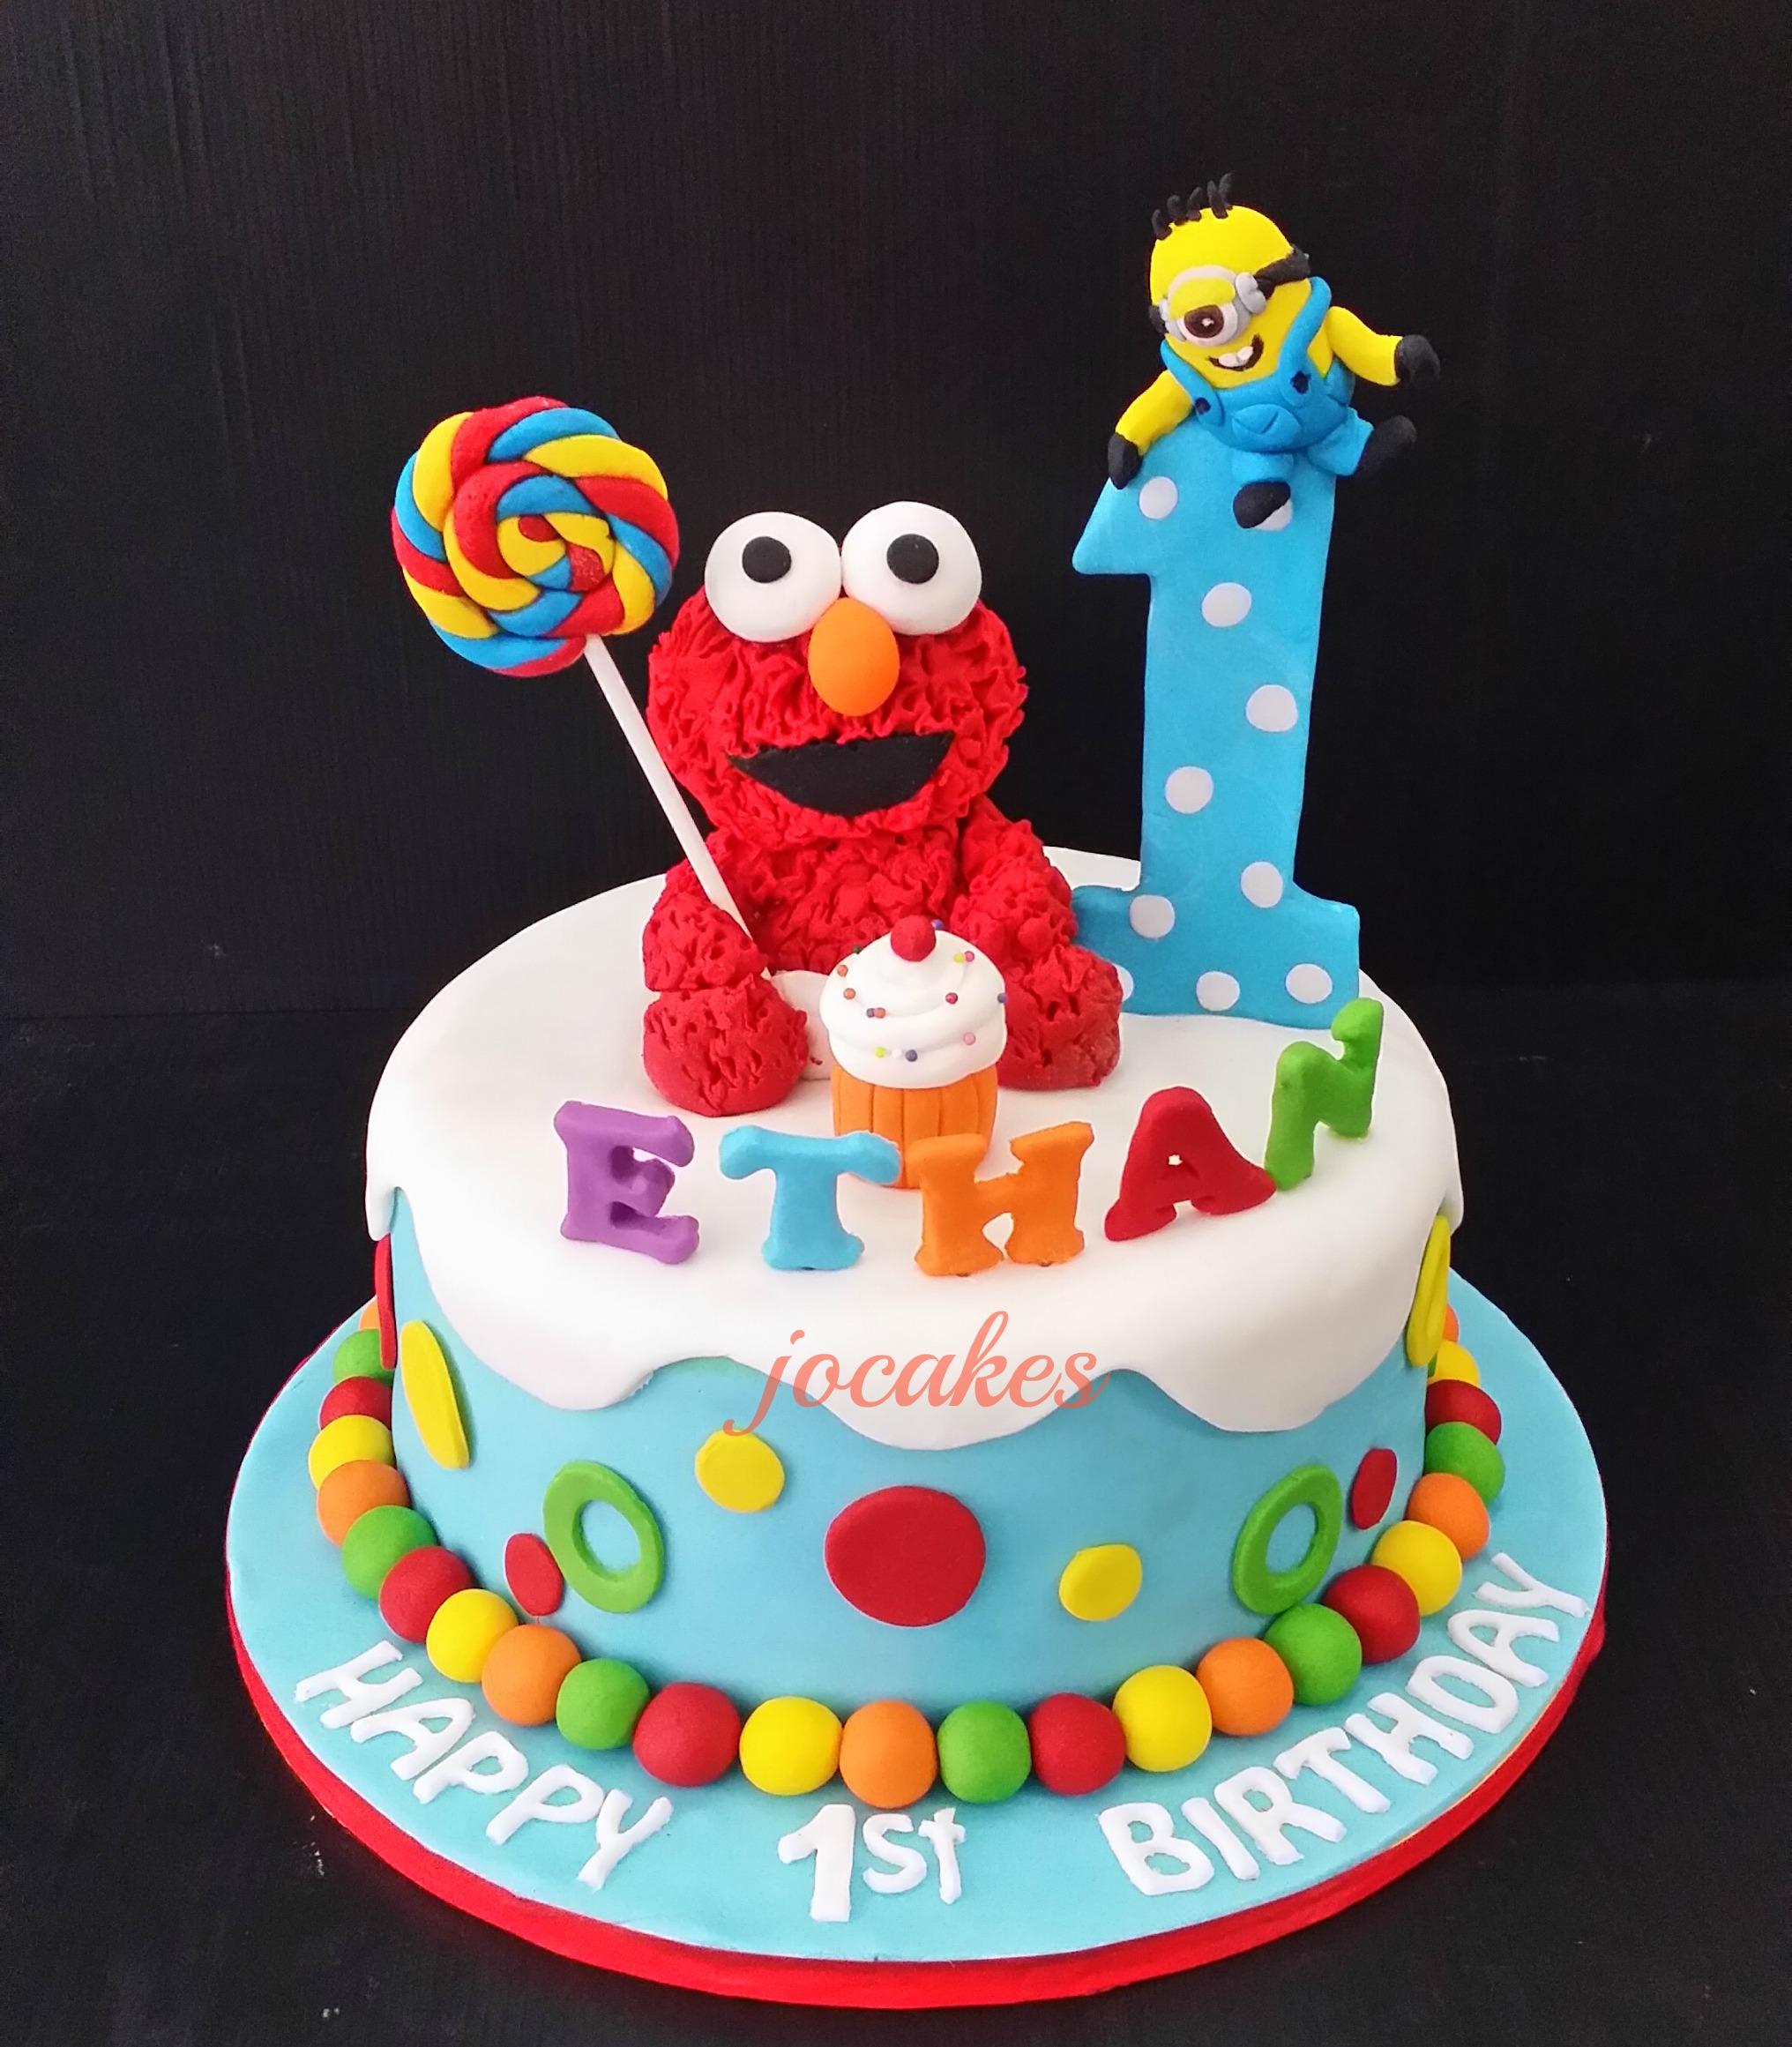 Elmo Themed Birthday Cakes Jpg 2032x2321